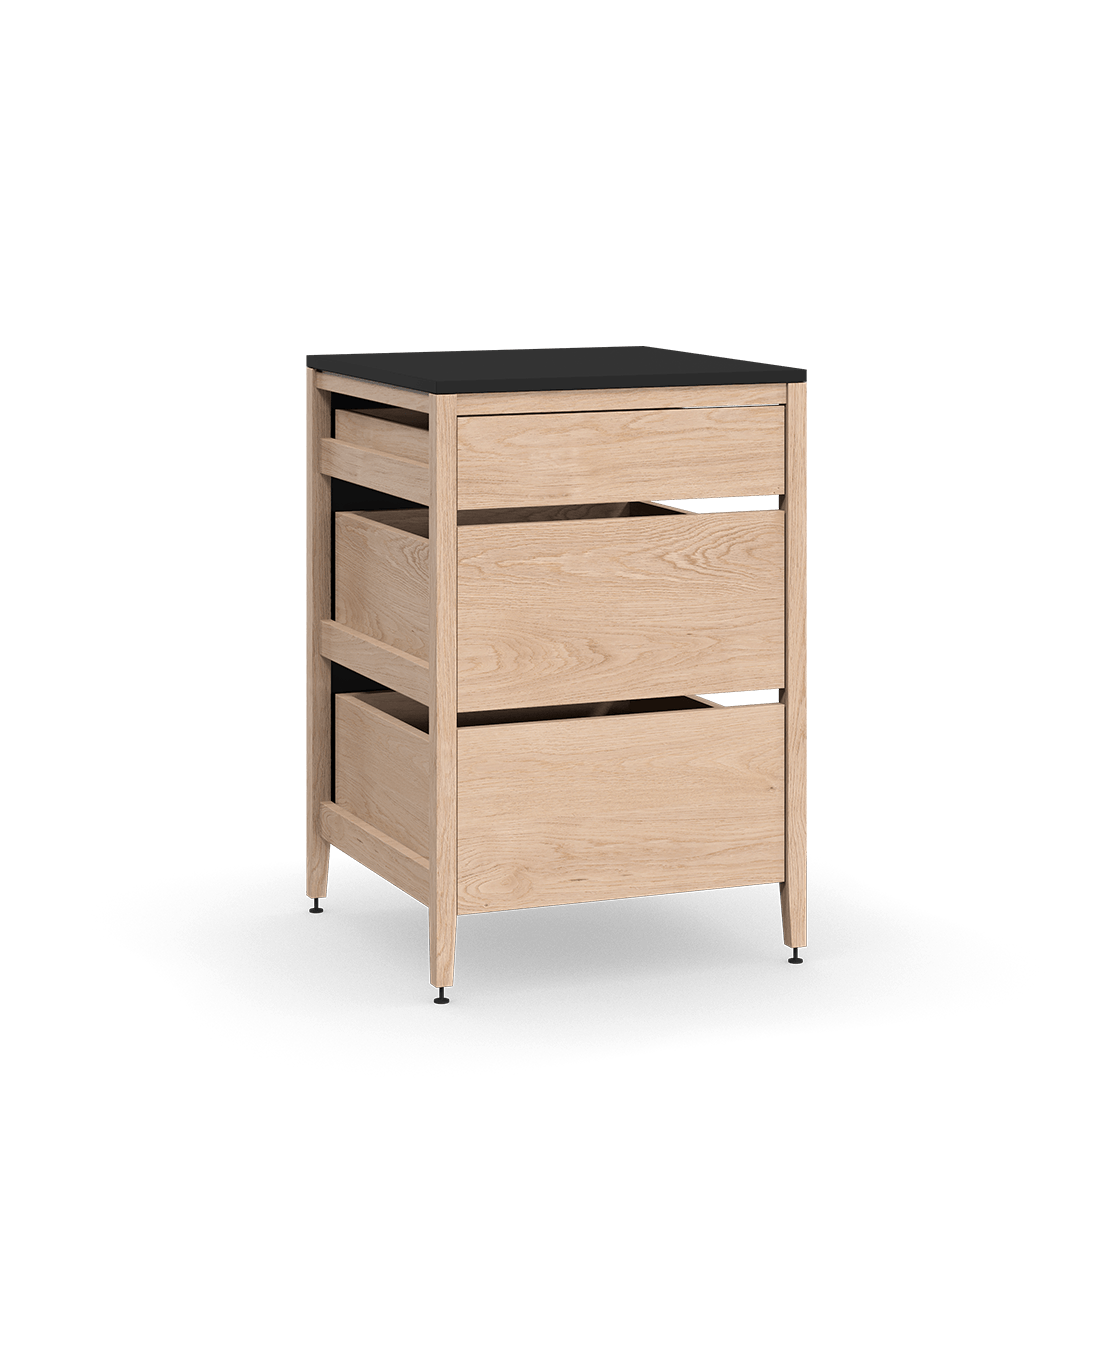 coquo radix white oak solid wood modular 3 drawers base kitchen cabinet 24 inch C1-C-24TB-3002-NA